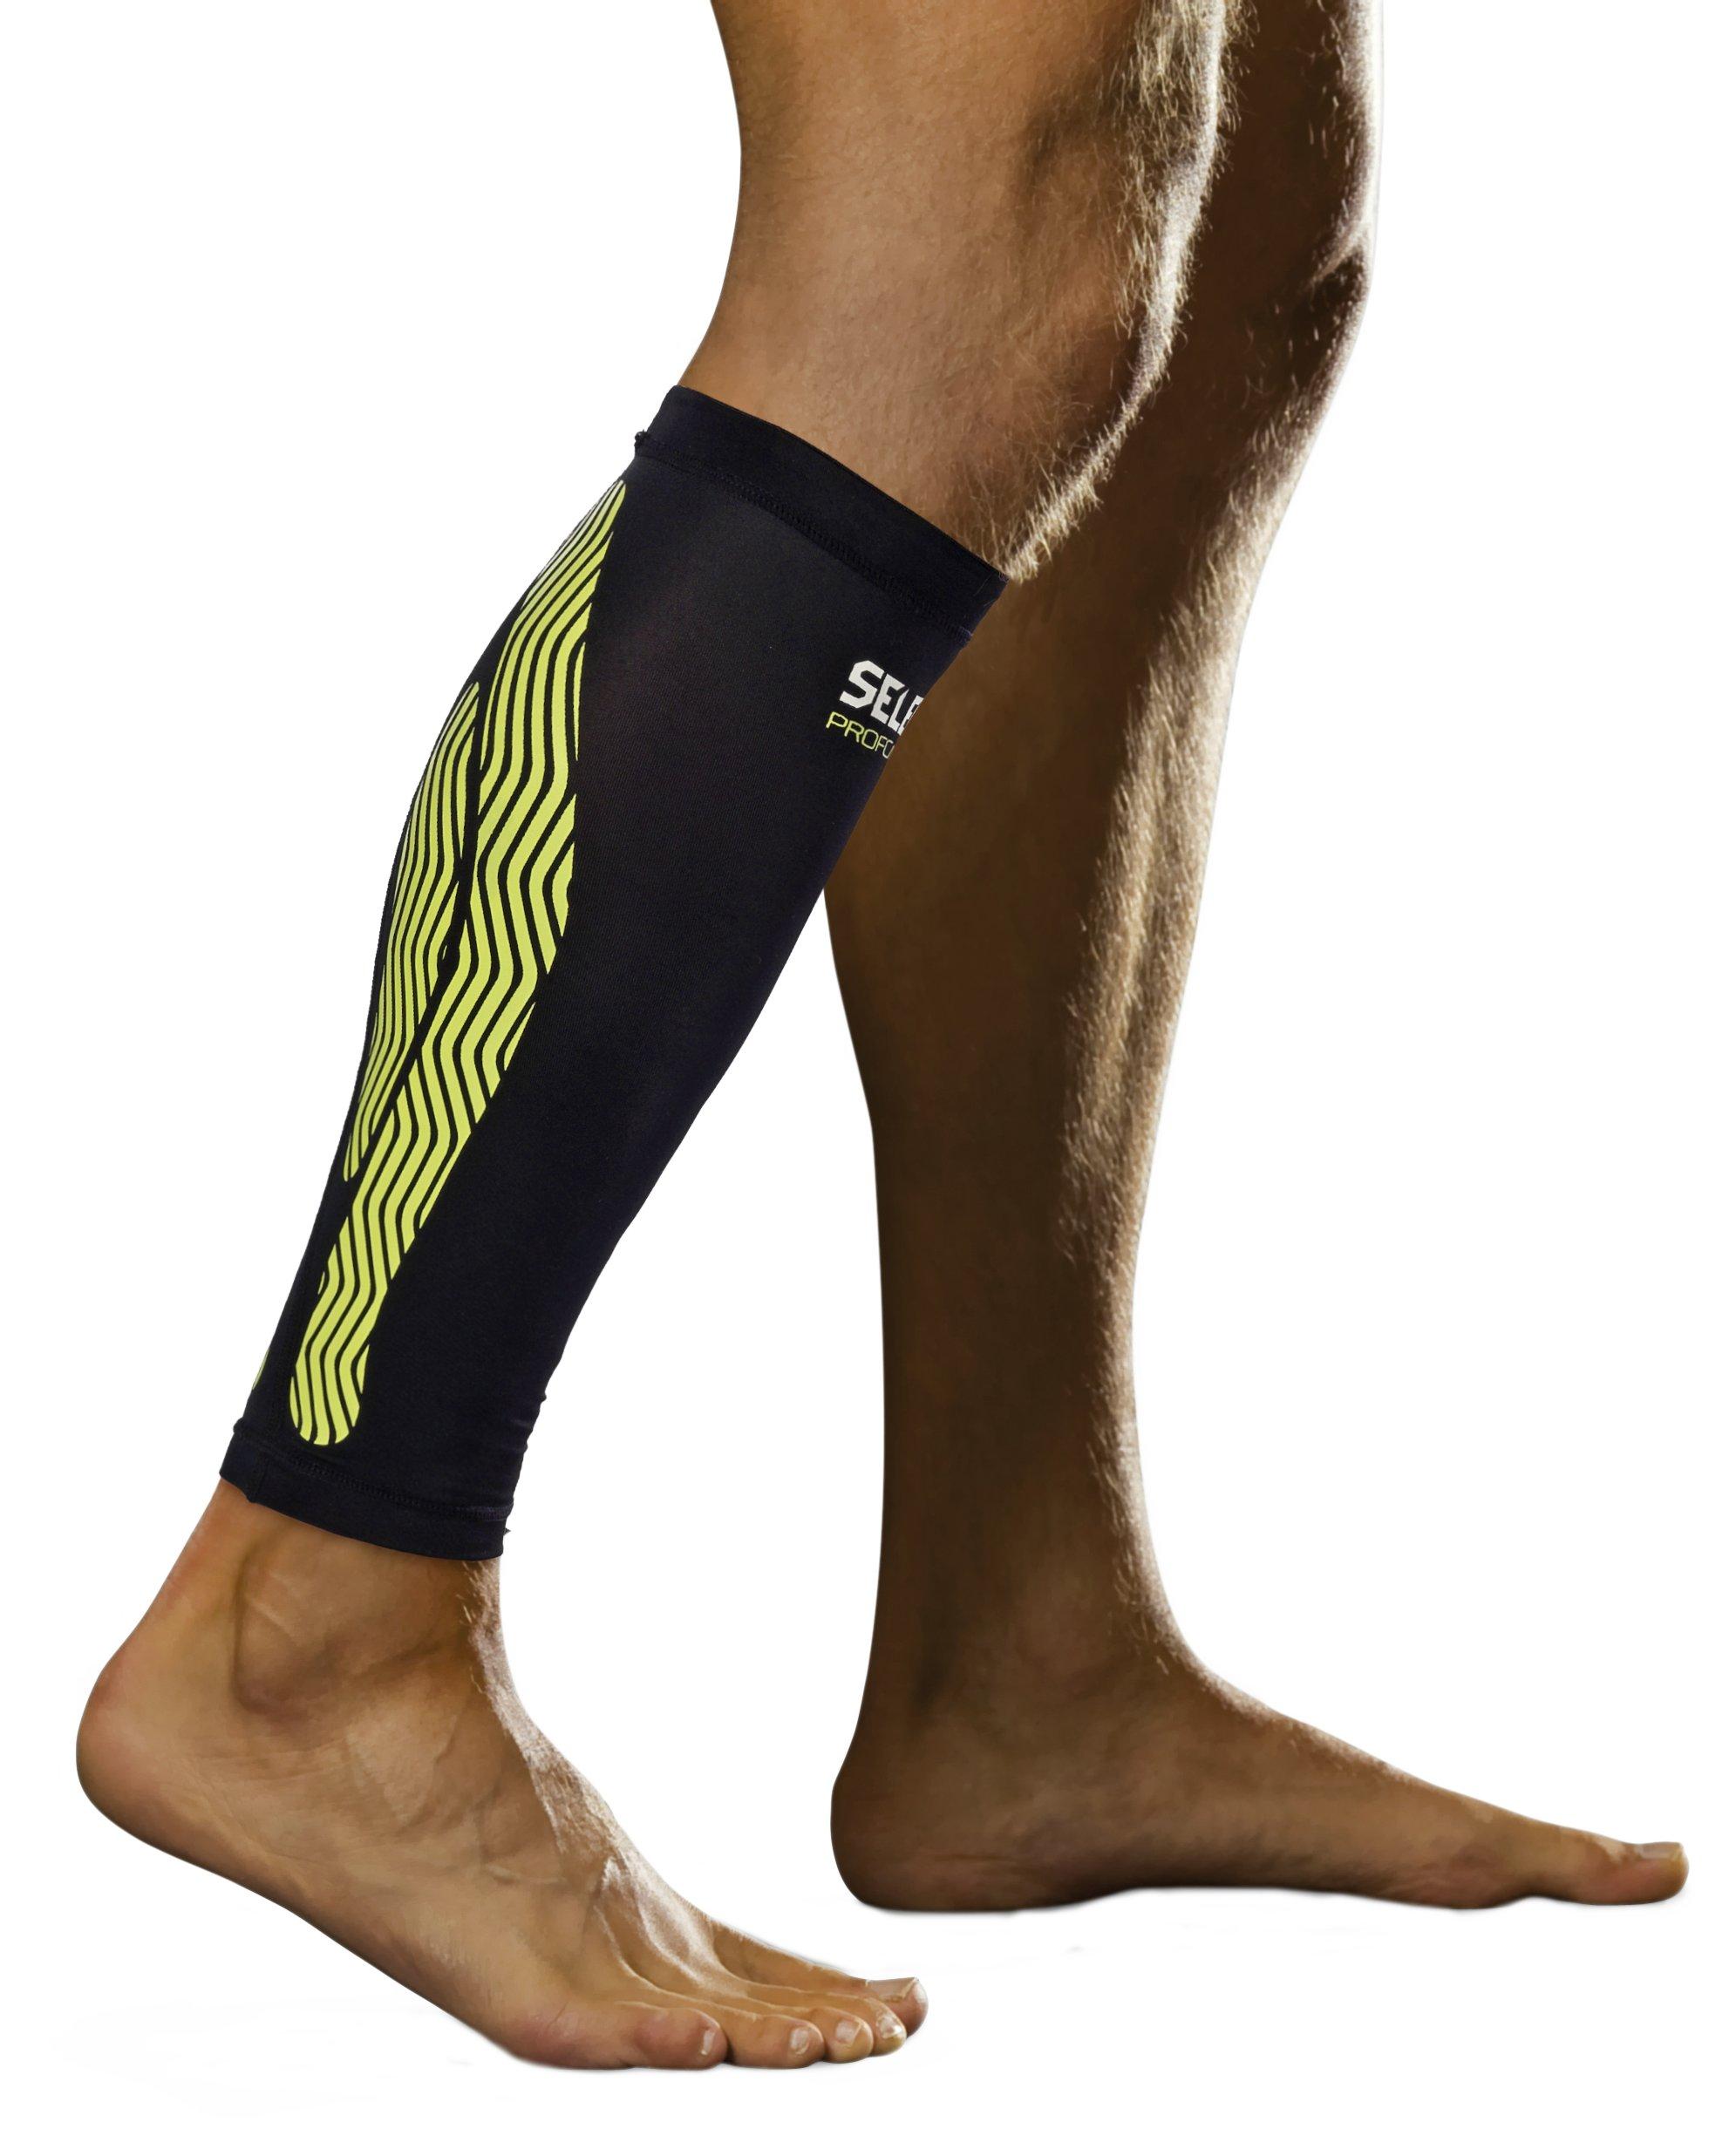 Vyberte Ponožky Compression Bands Calf 6150 XL